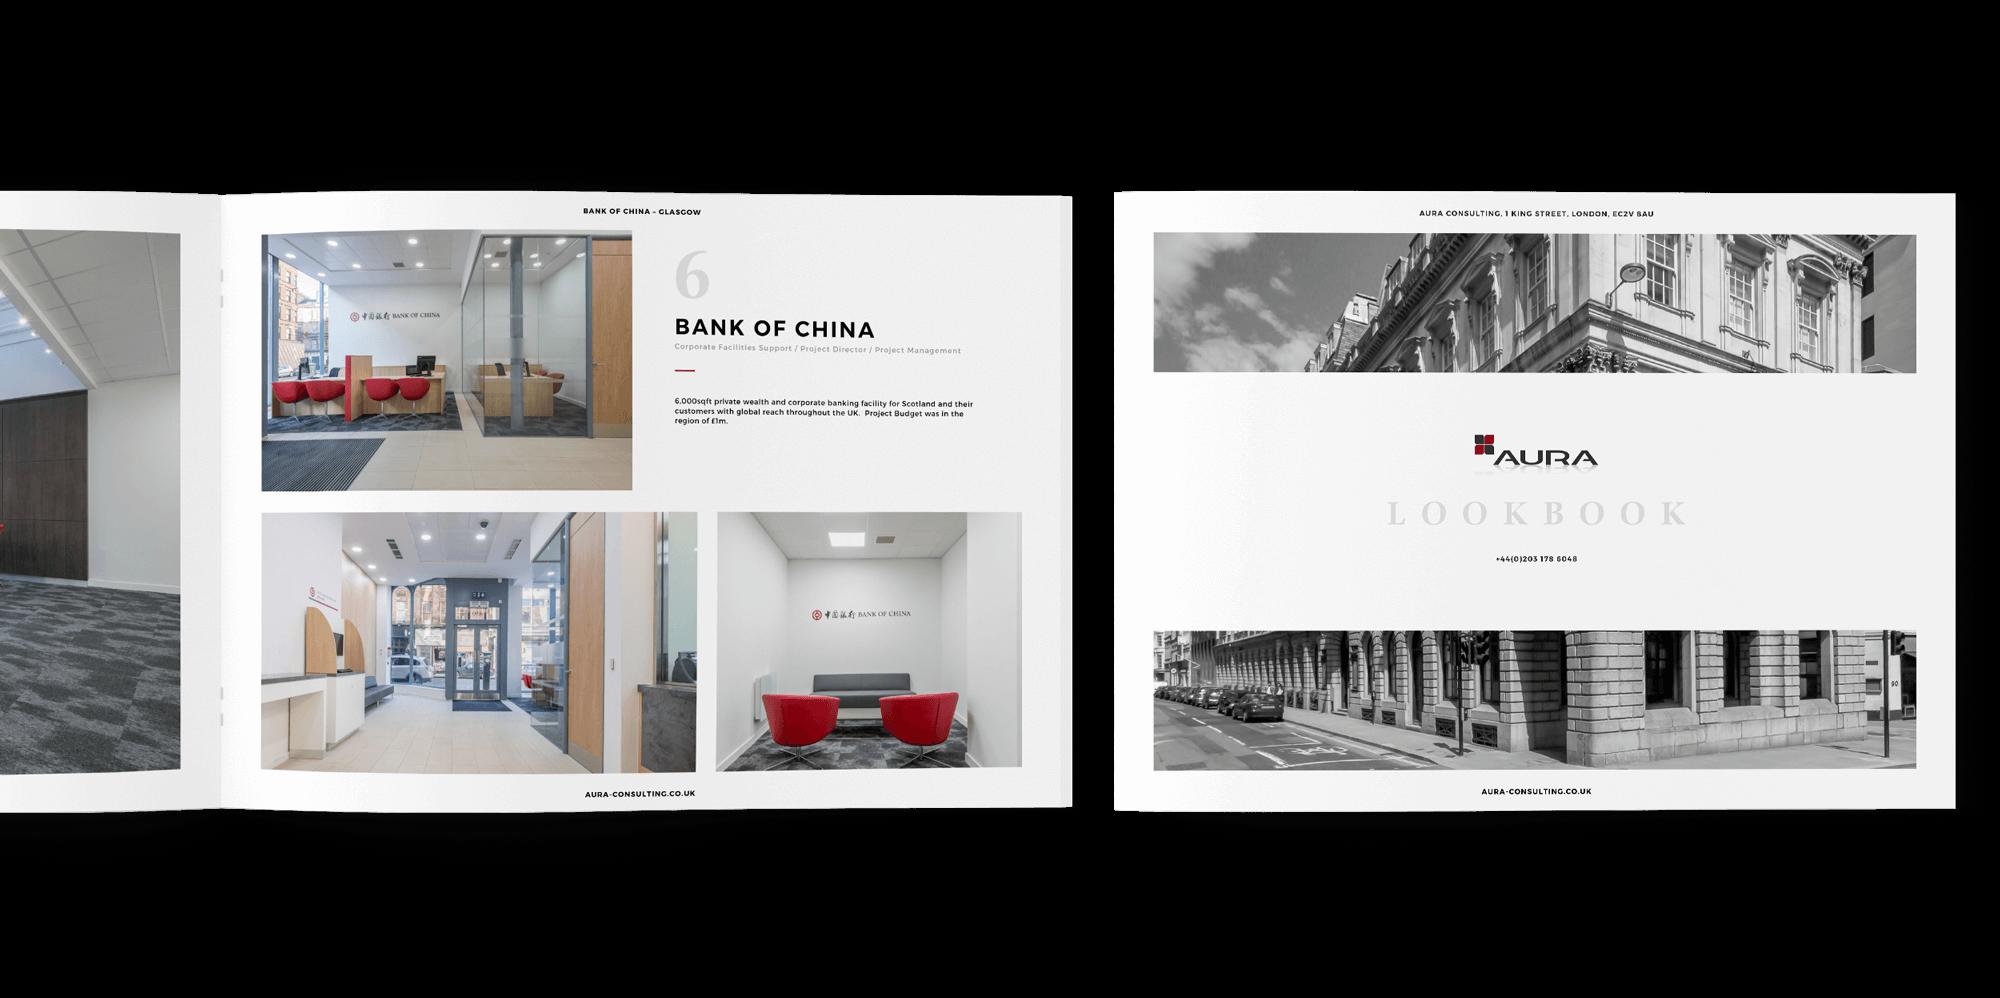 aura-brochure-mockup-cover-3